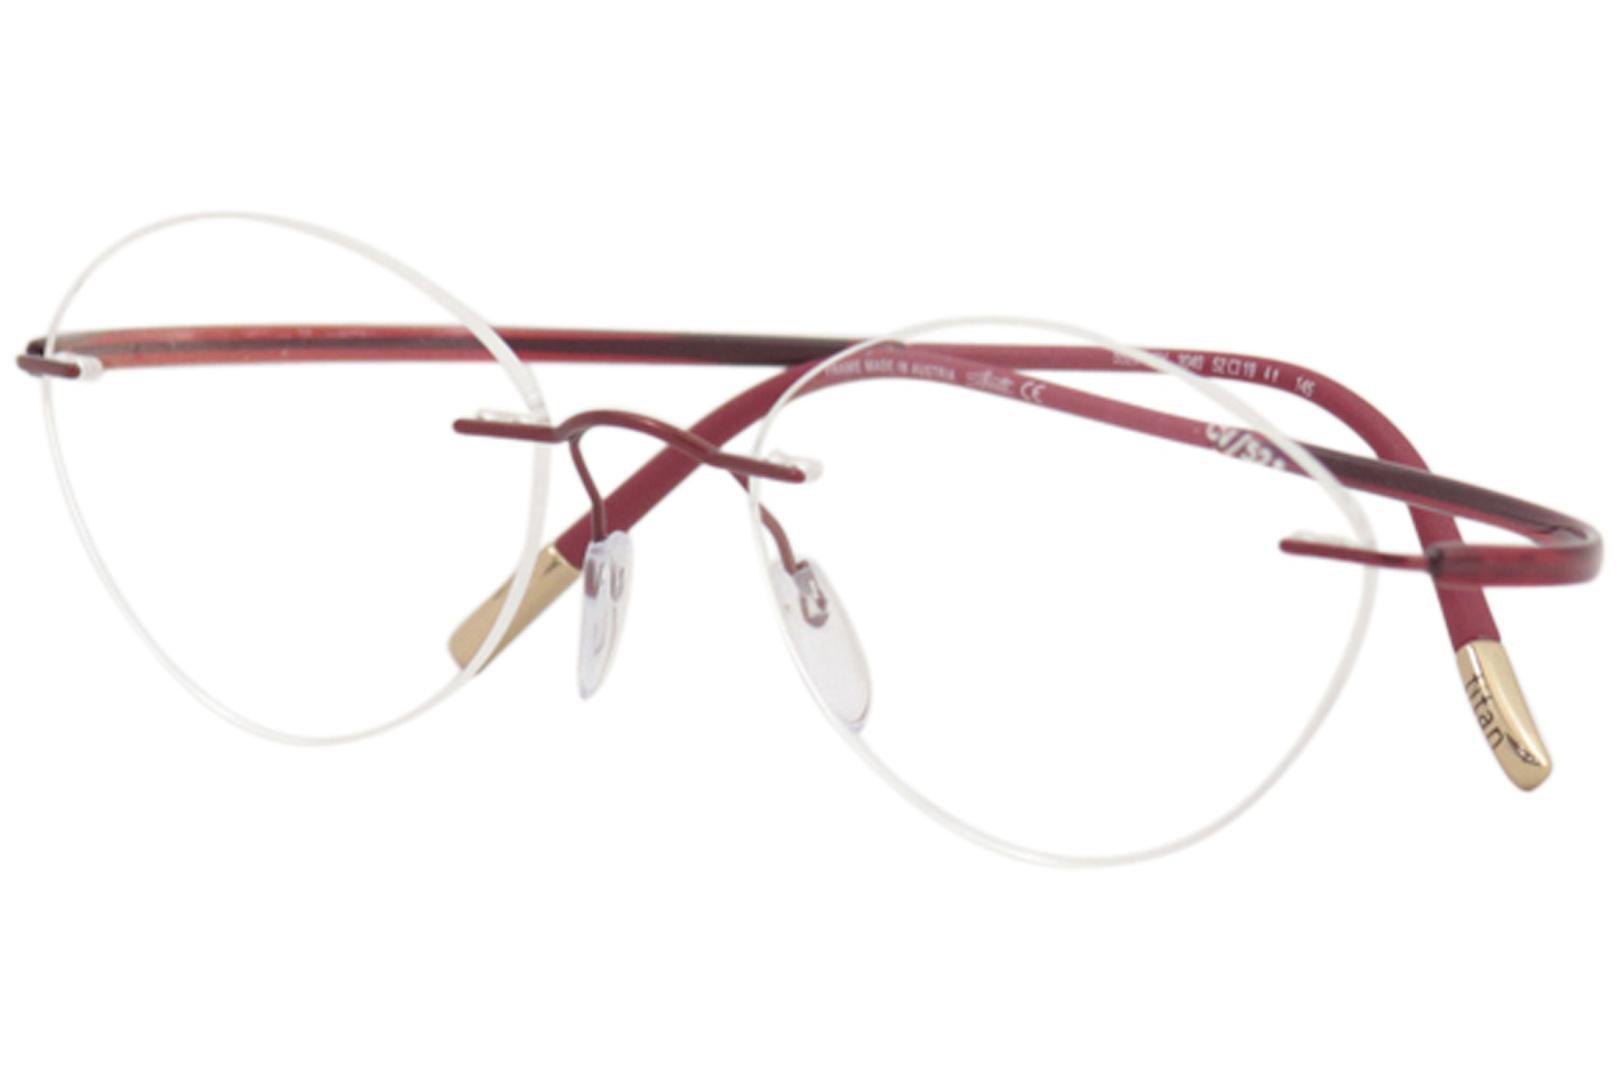 630f3d6dcd04 Silhouette Eyeglasses Essence 5523 Rimless Optical Frame